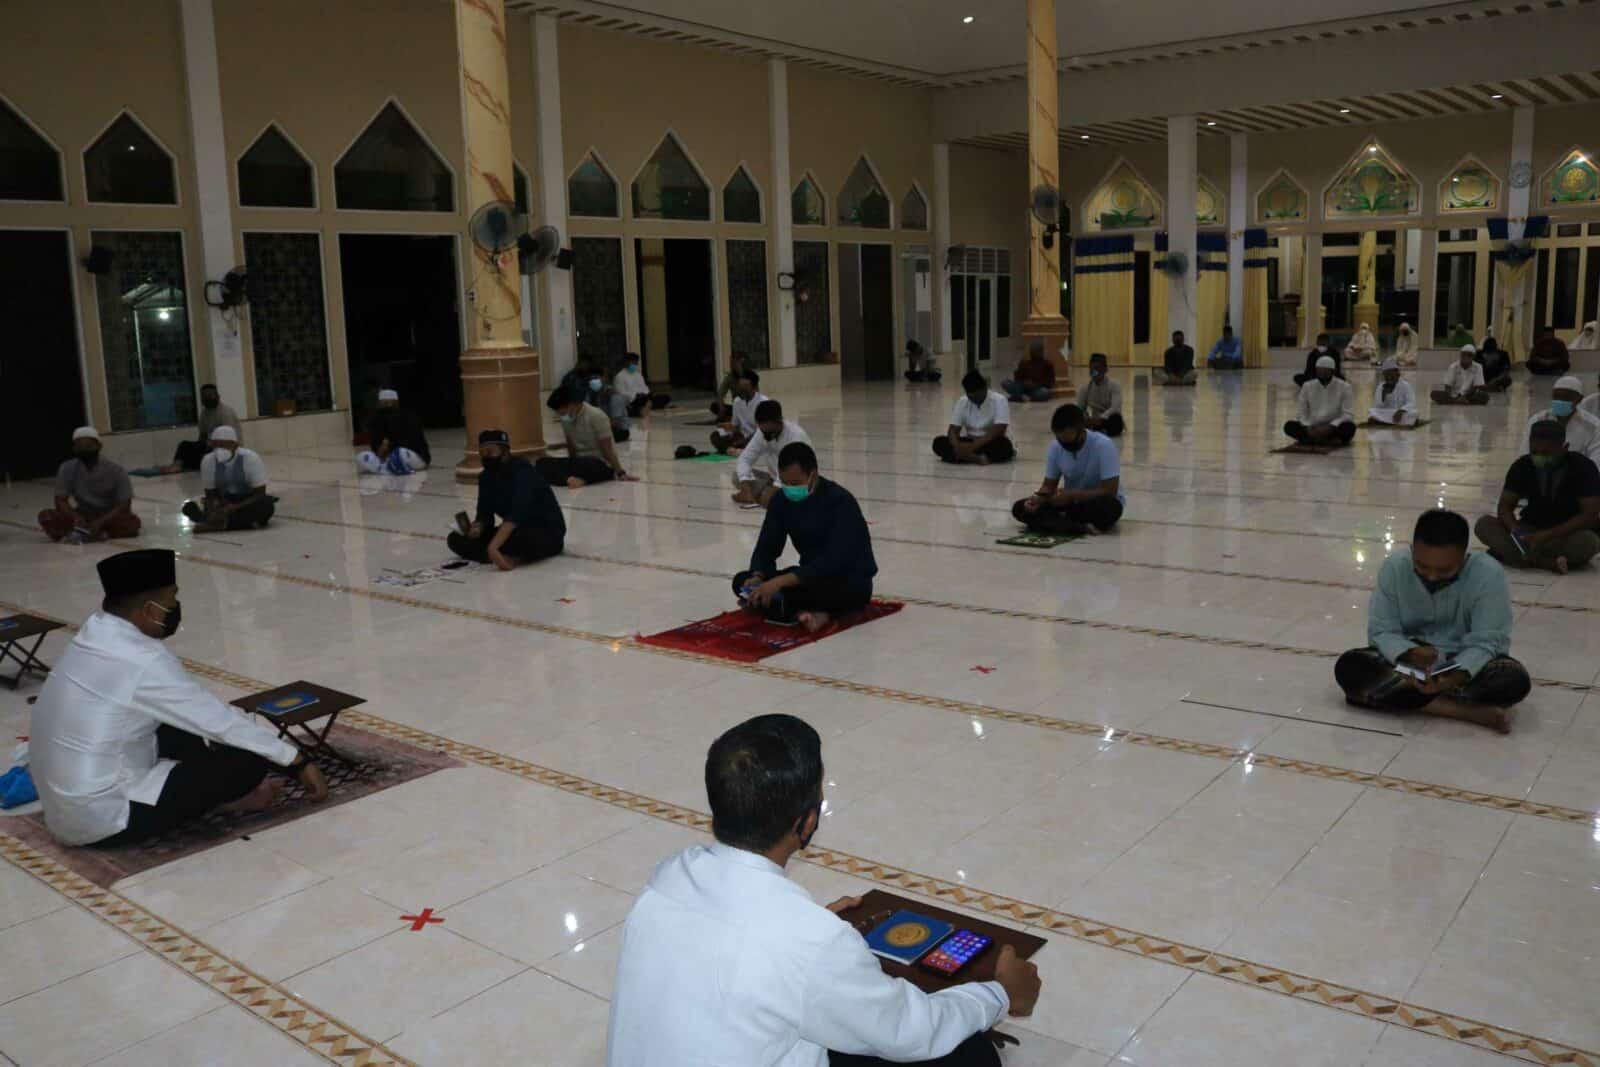 Dengan Tetap Perhatikan Protokol Kesehatan Covid-19 Lanud Sjamsudin Noor Laksanakan Doa Bersama Akhir Tahun 2020 dan Menyambut Tahun Baru 2021 Secara Hikmat